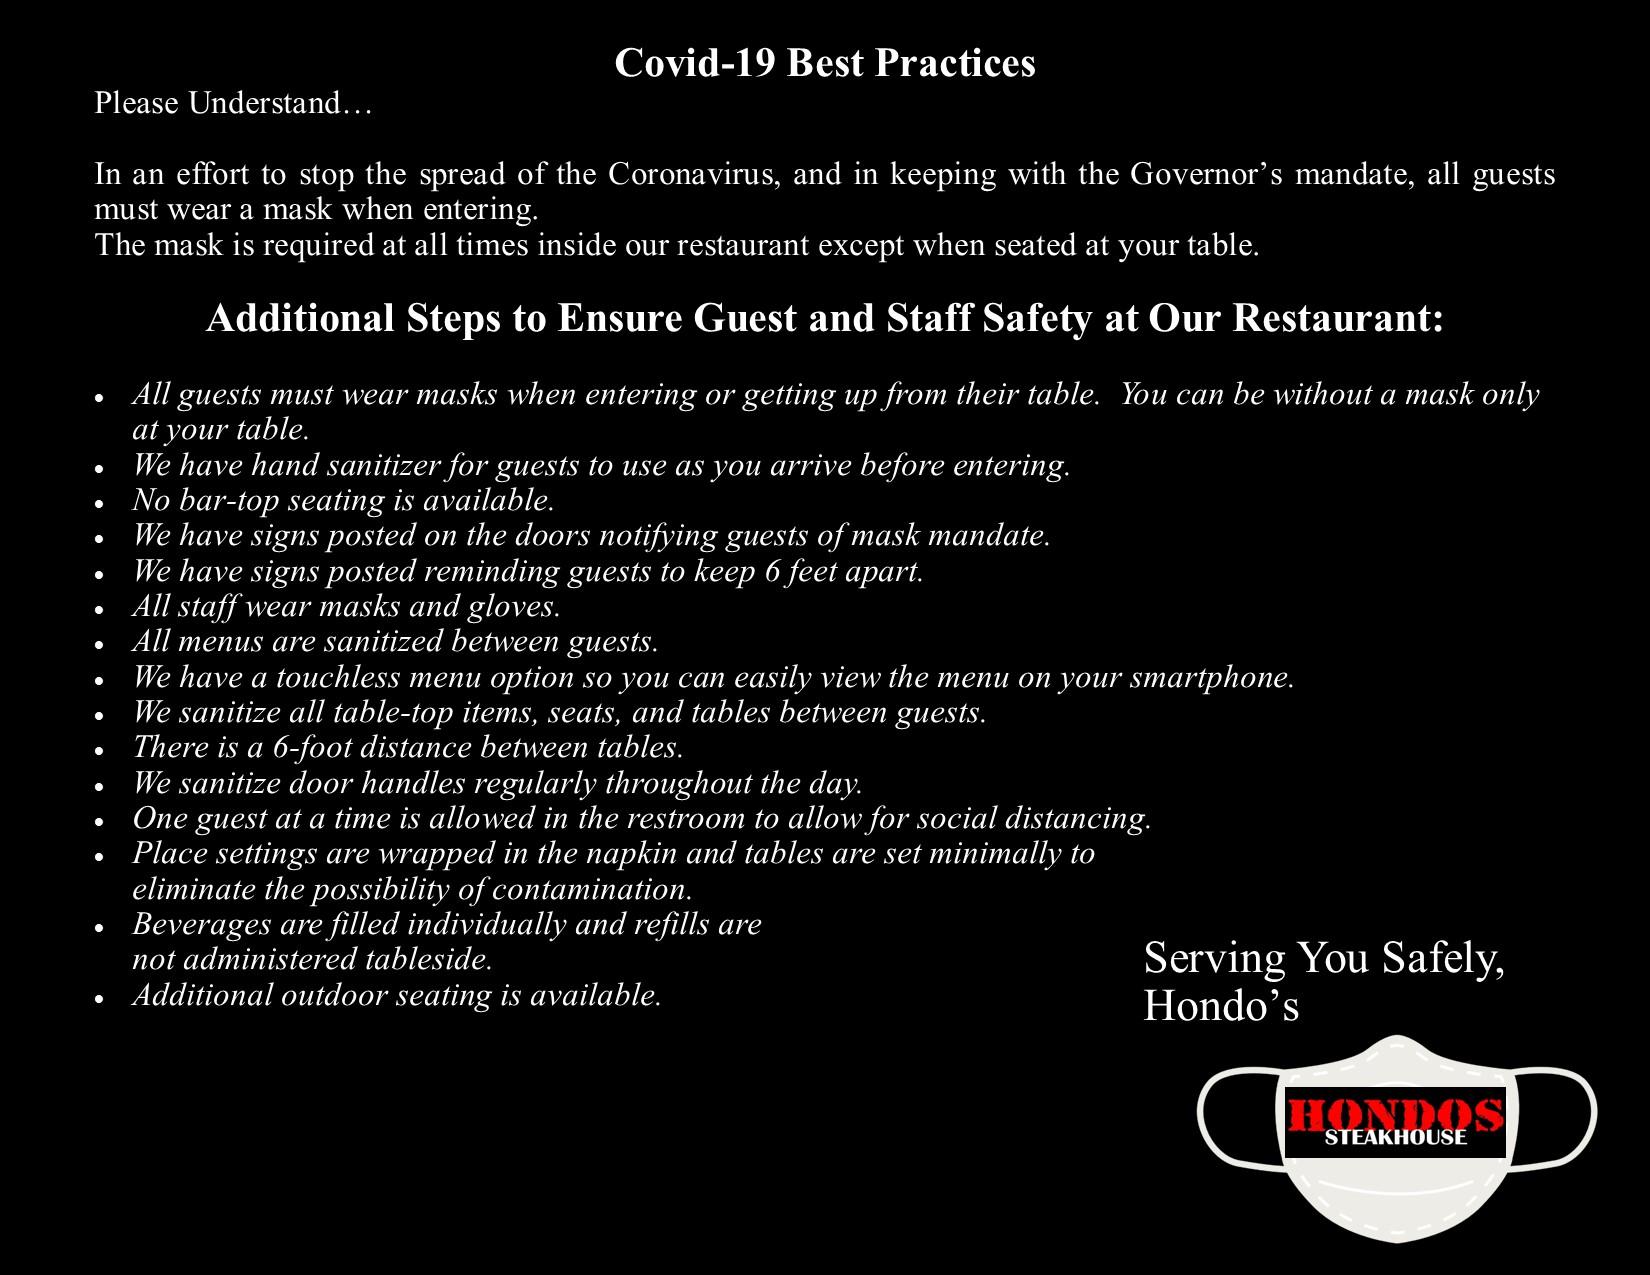 hondos-covid-best-practices